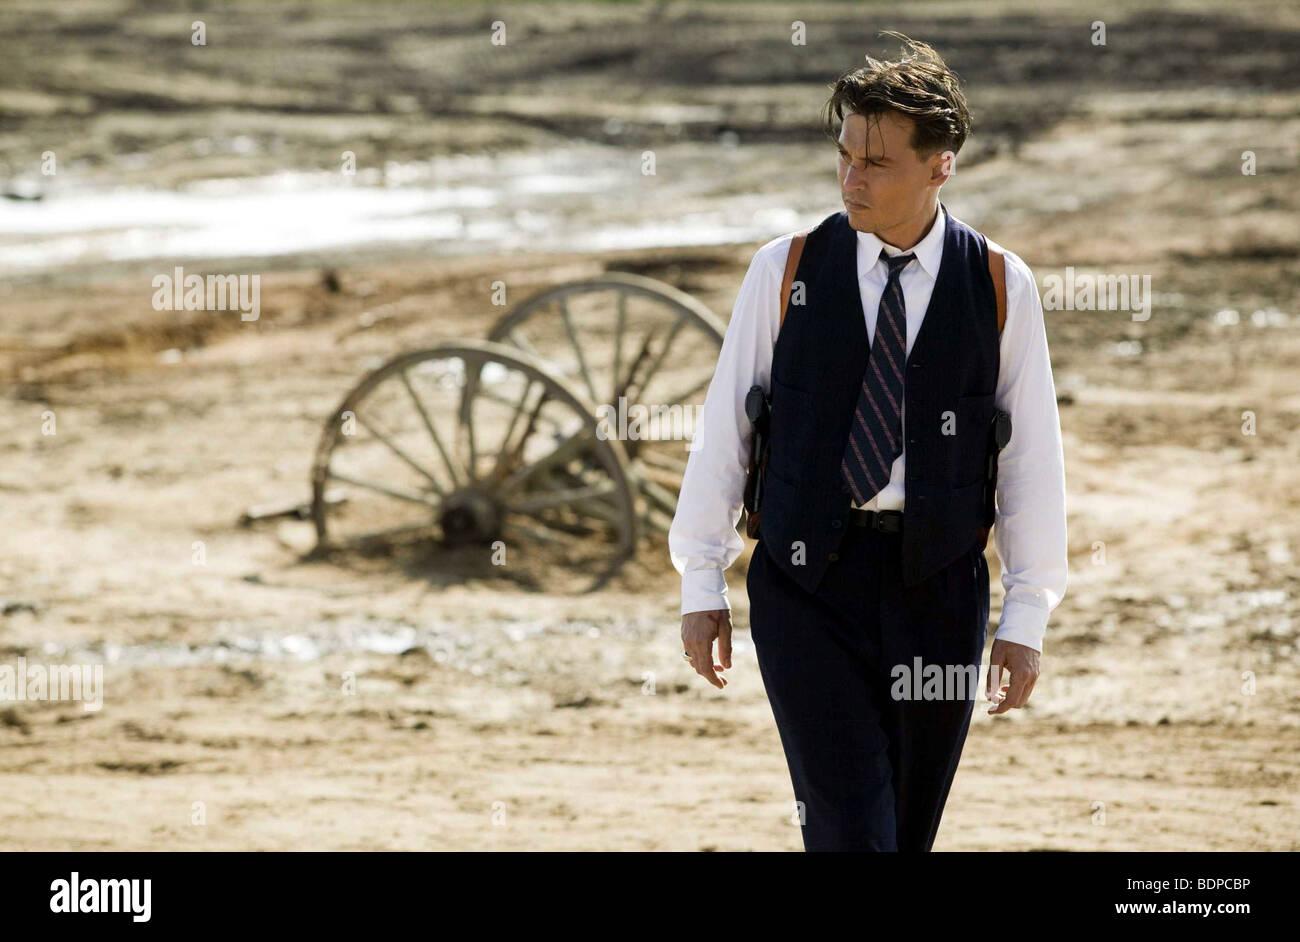 Public Enemies Year : 2009 Director : Michael Mann Johnny Depp - Stock Image